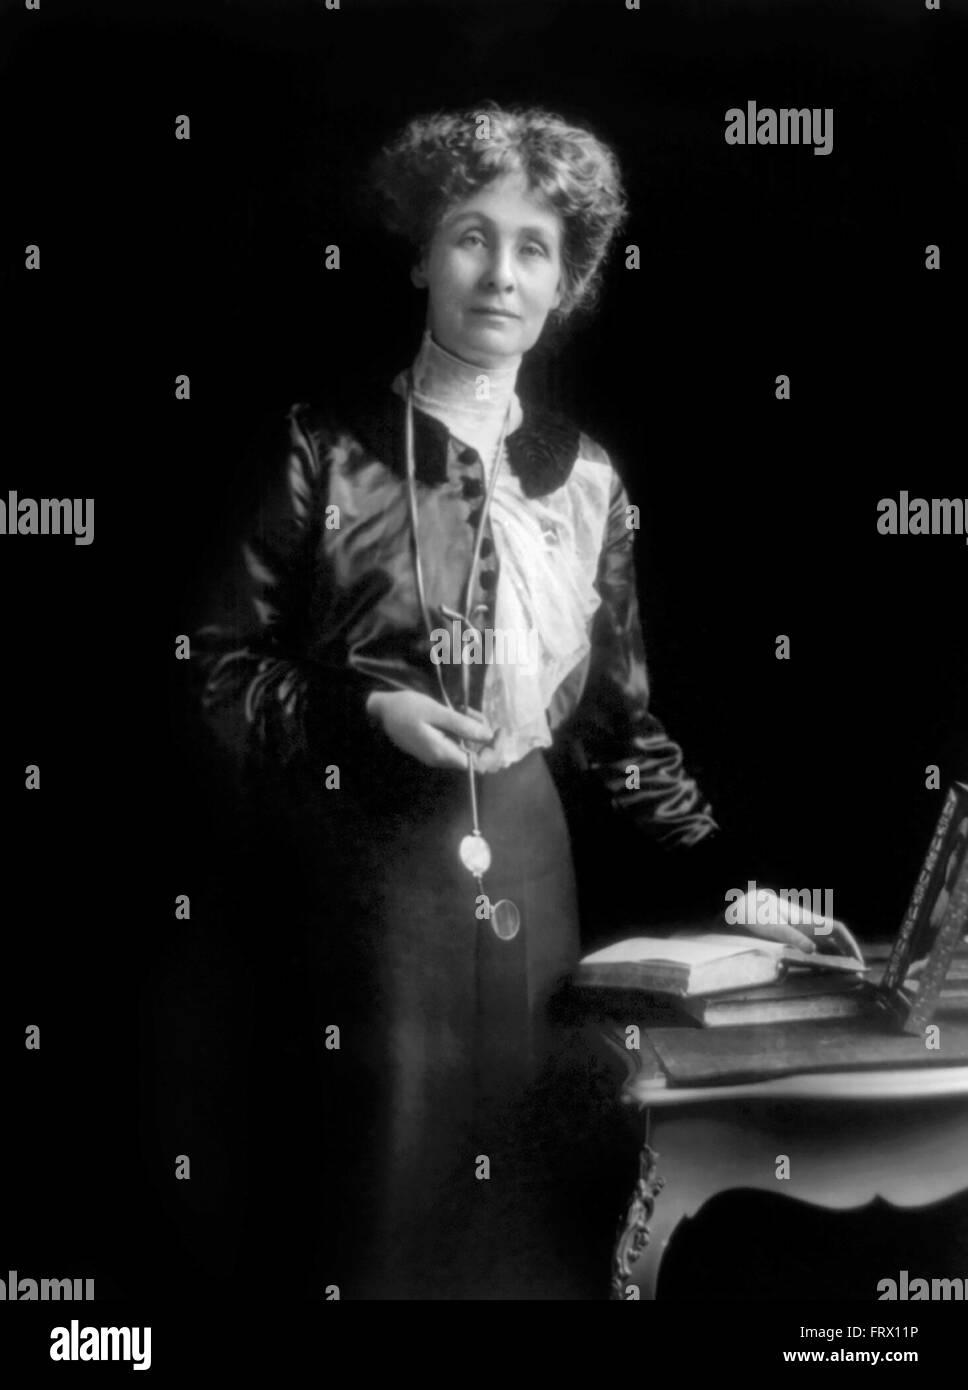 Emmeline Pankhurst, leader of the British suffragette movement, c.1913 Stock Photo